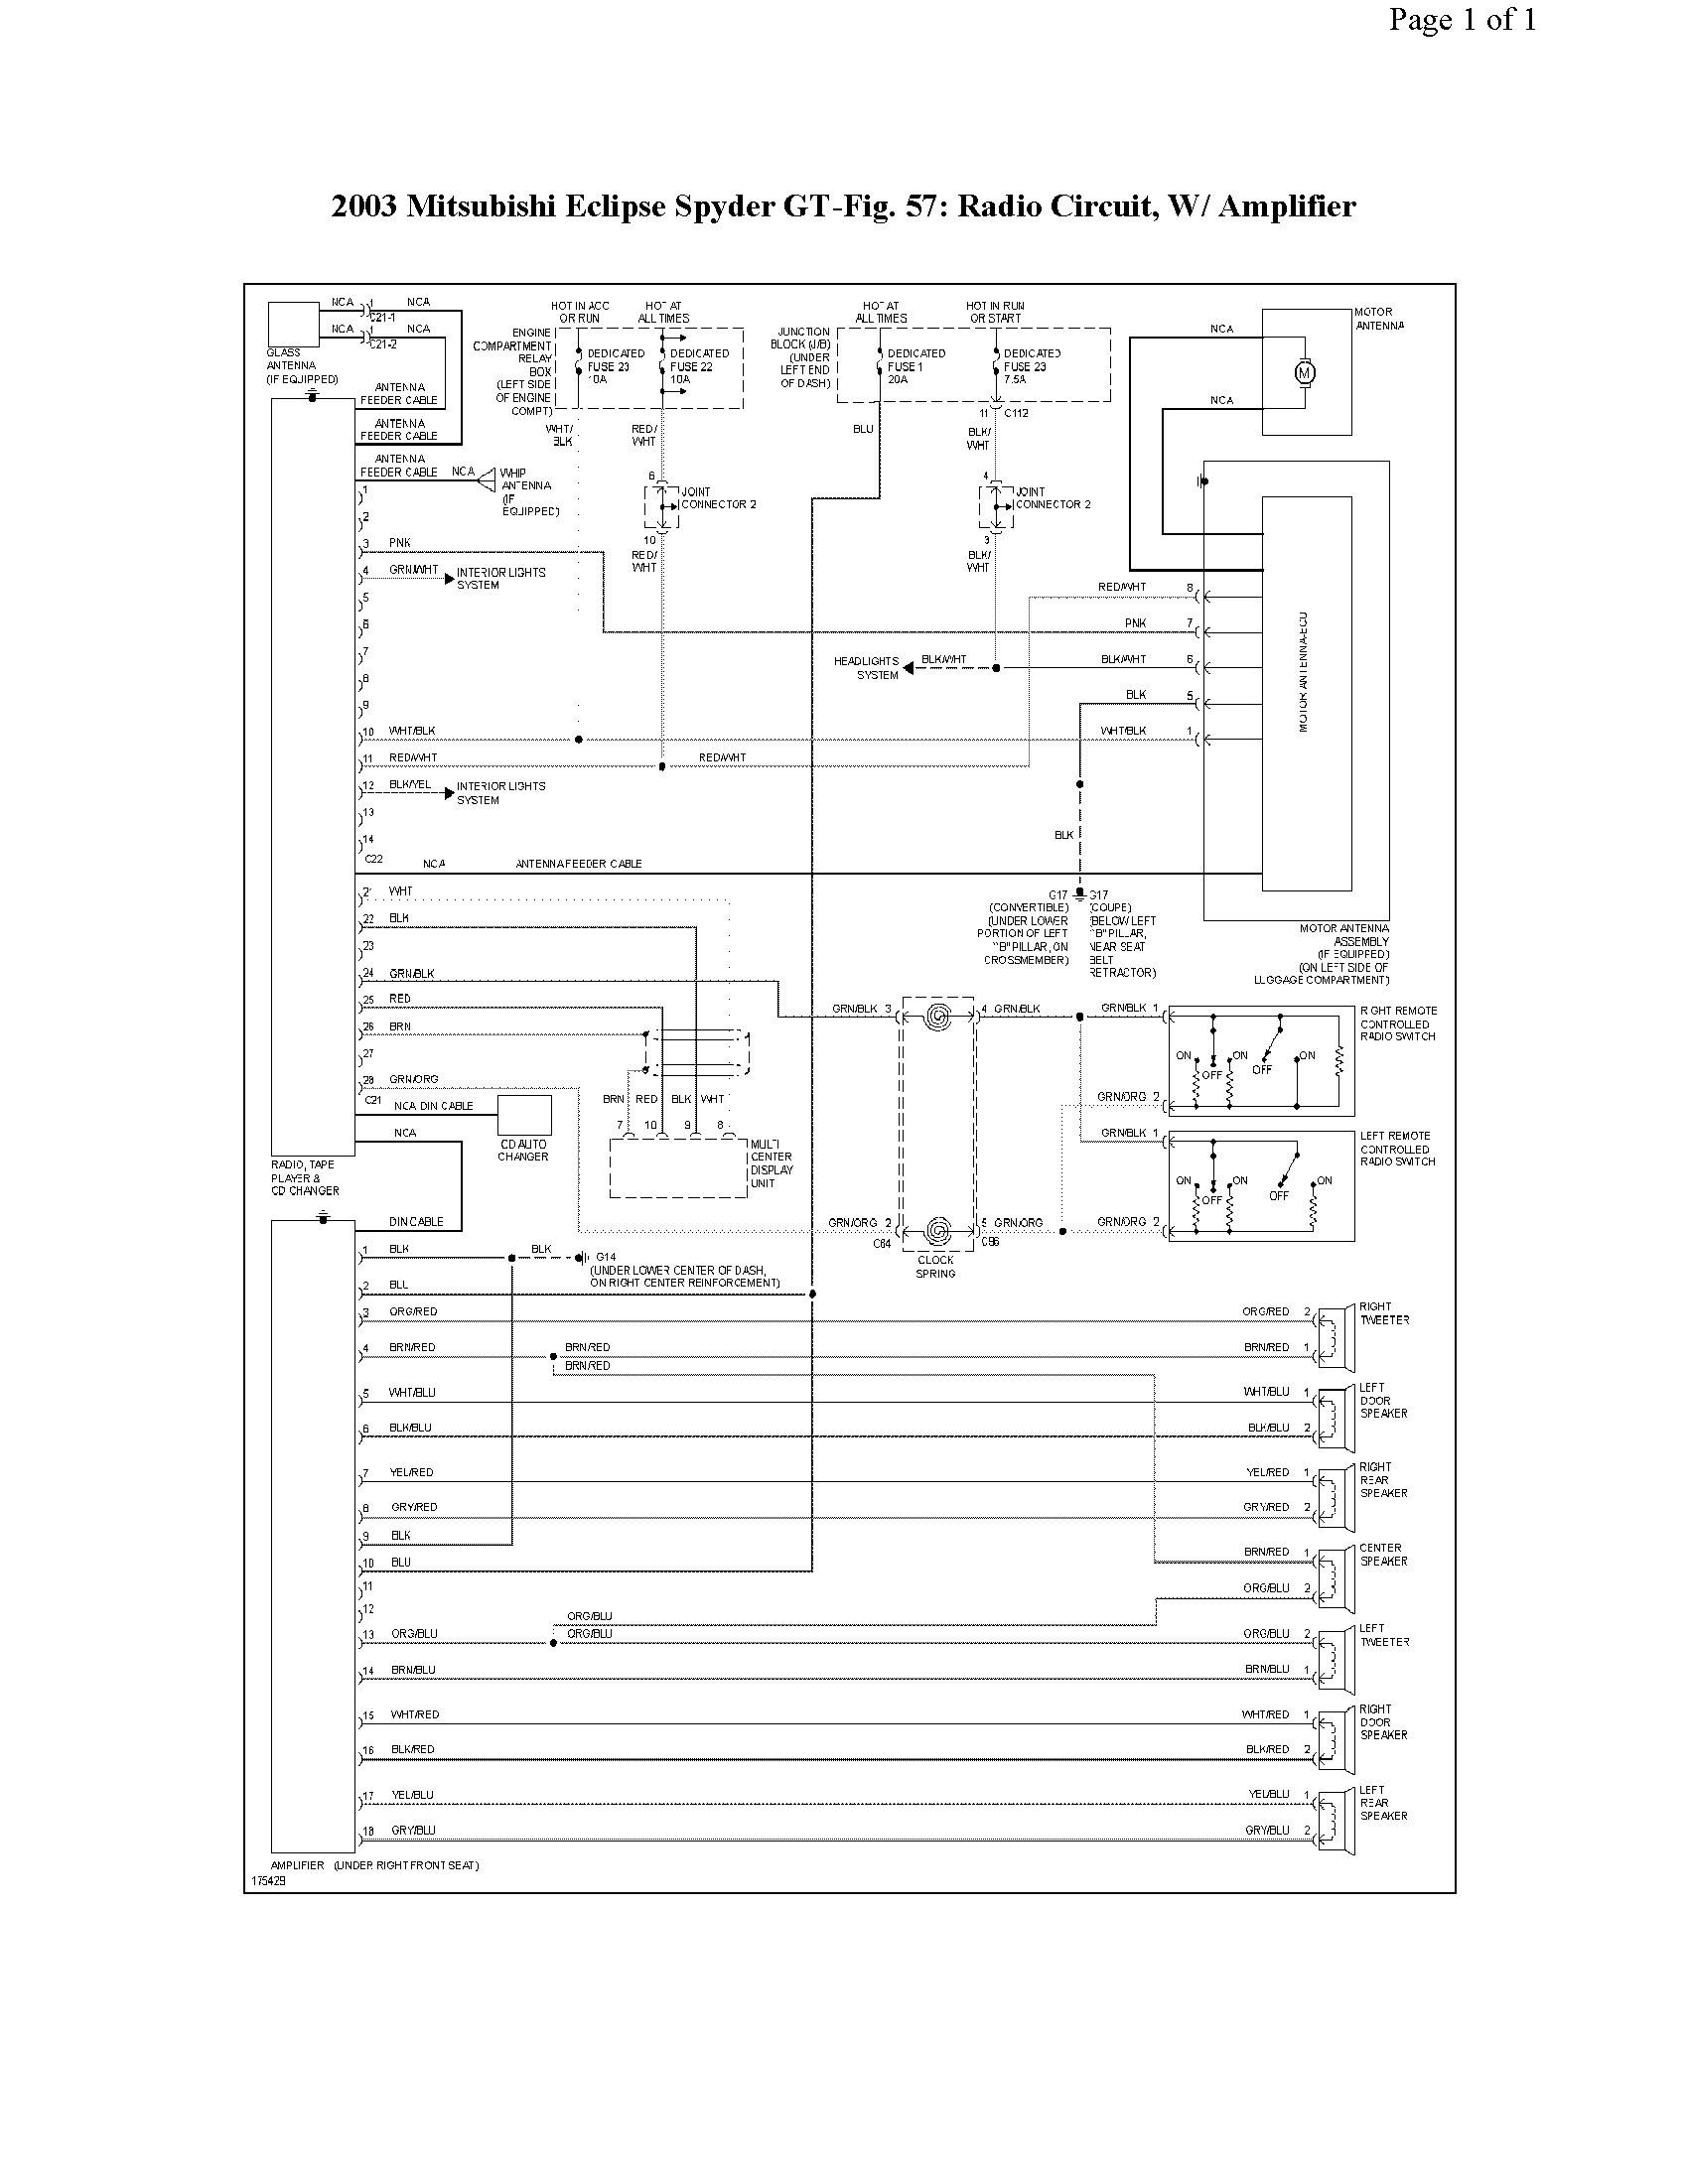 Mitsubishi Galant Radio Wiring Diagram -2003 Toyota Celica Gt Wiring Diagram  | Begeboy Wiring Diagram Source | 2003 Mitsubishi Galant Wiring Diagram |  | Begeboy Wiring Diagram Source